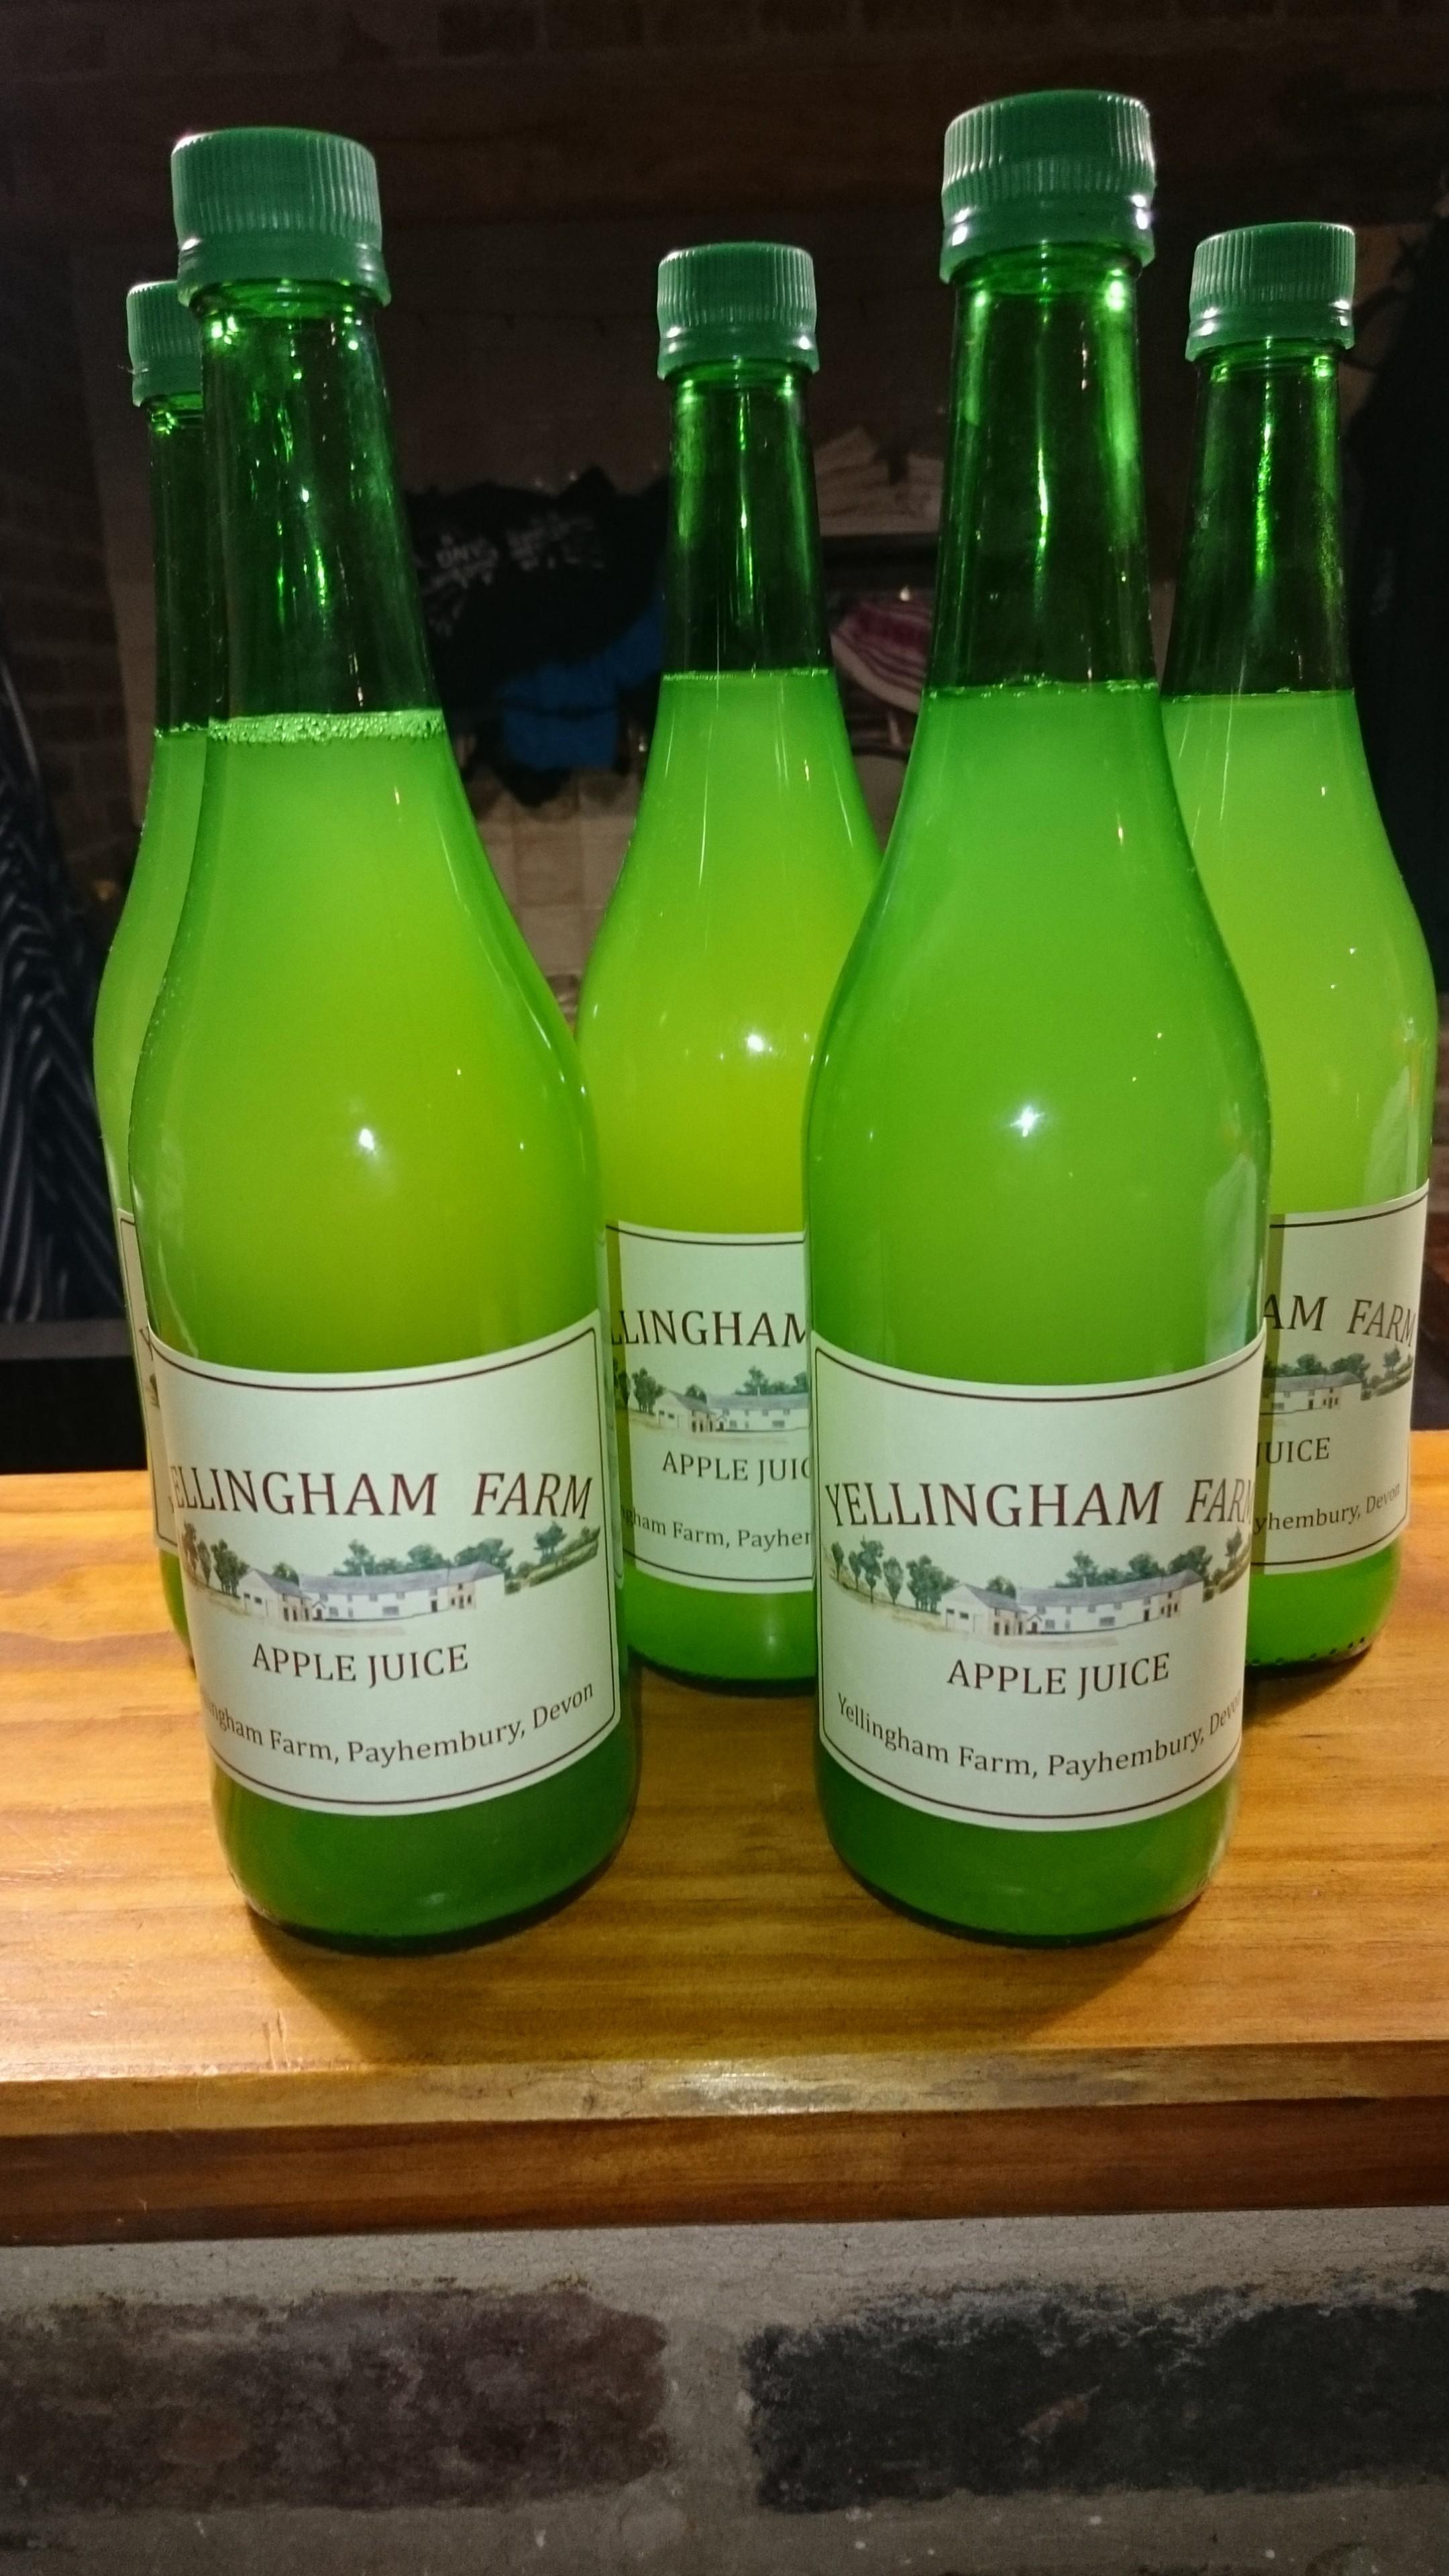 Yellingham apple juice bottles